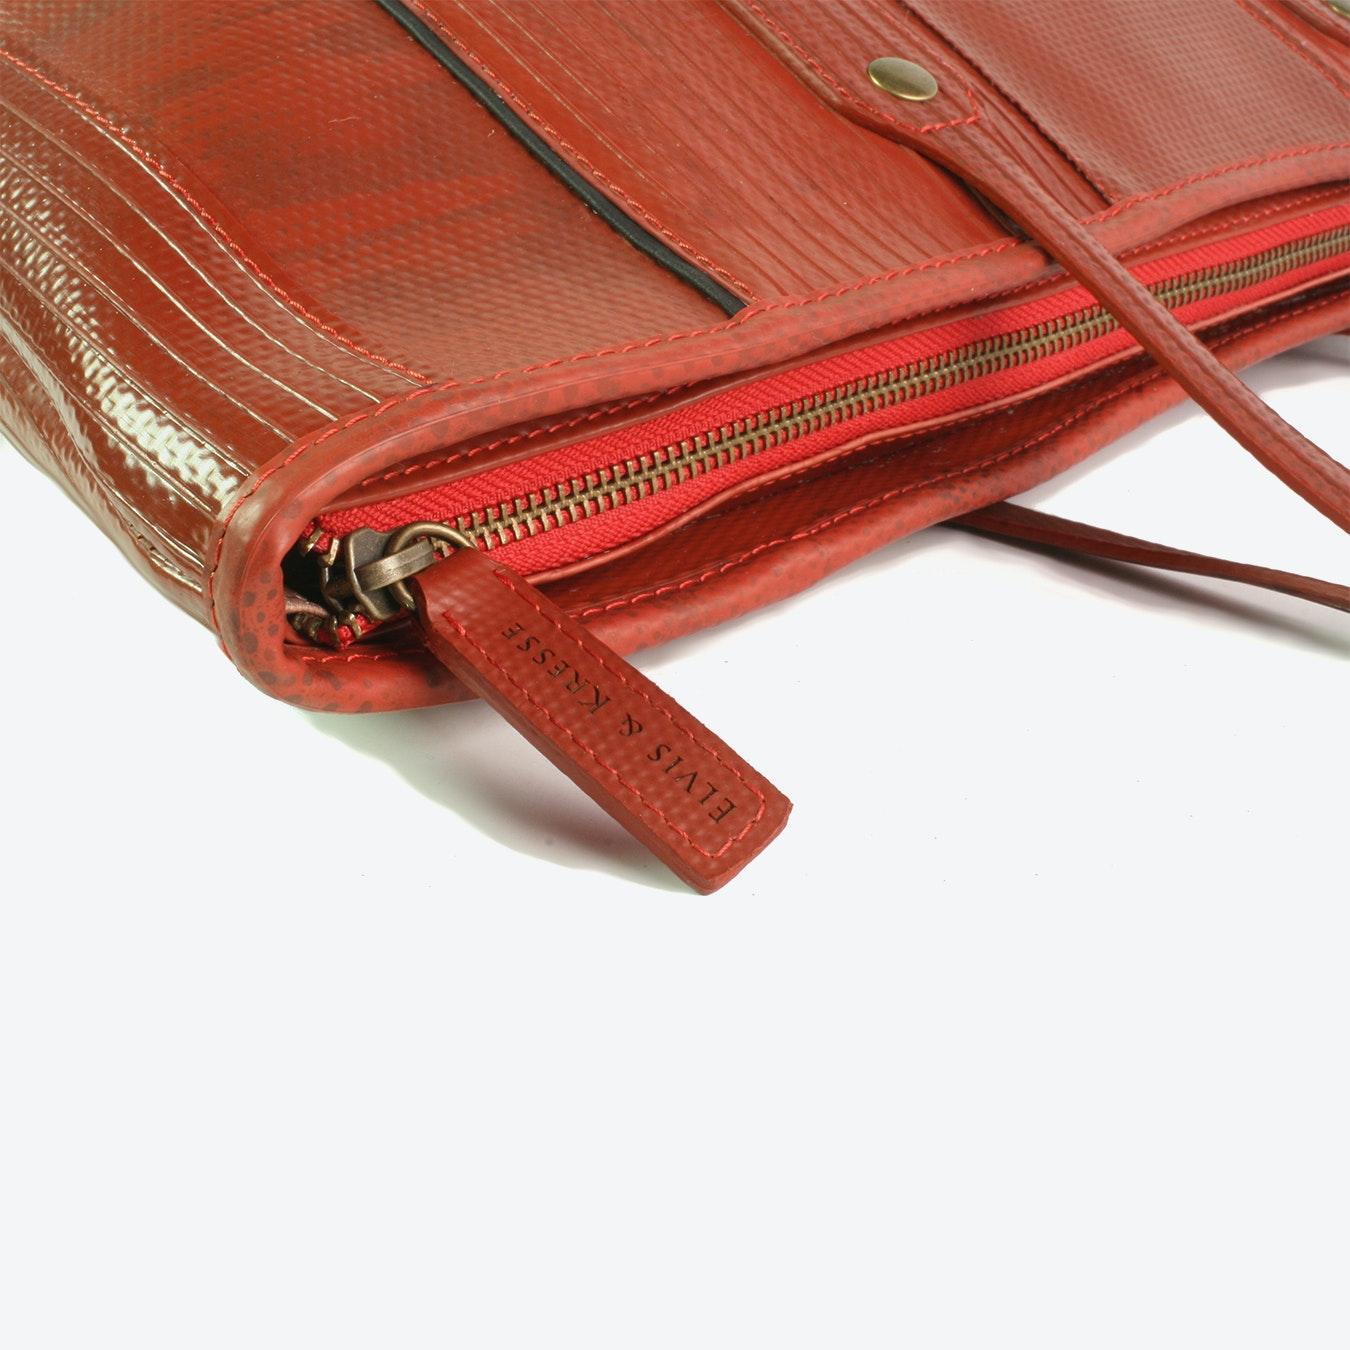 fcb3dd450335 Tote Bag in Red Fire-Hoses by Elvis   Kresse - Fy